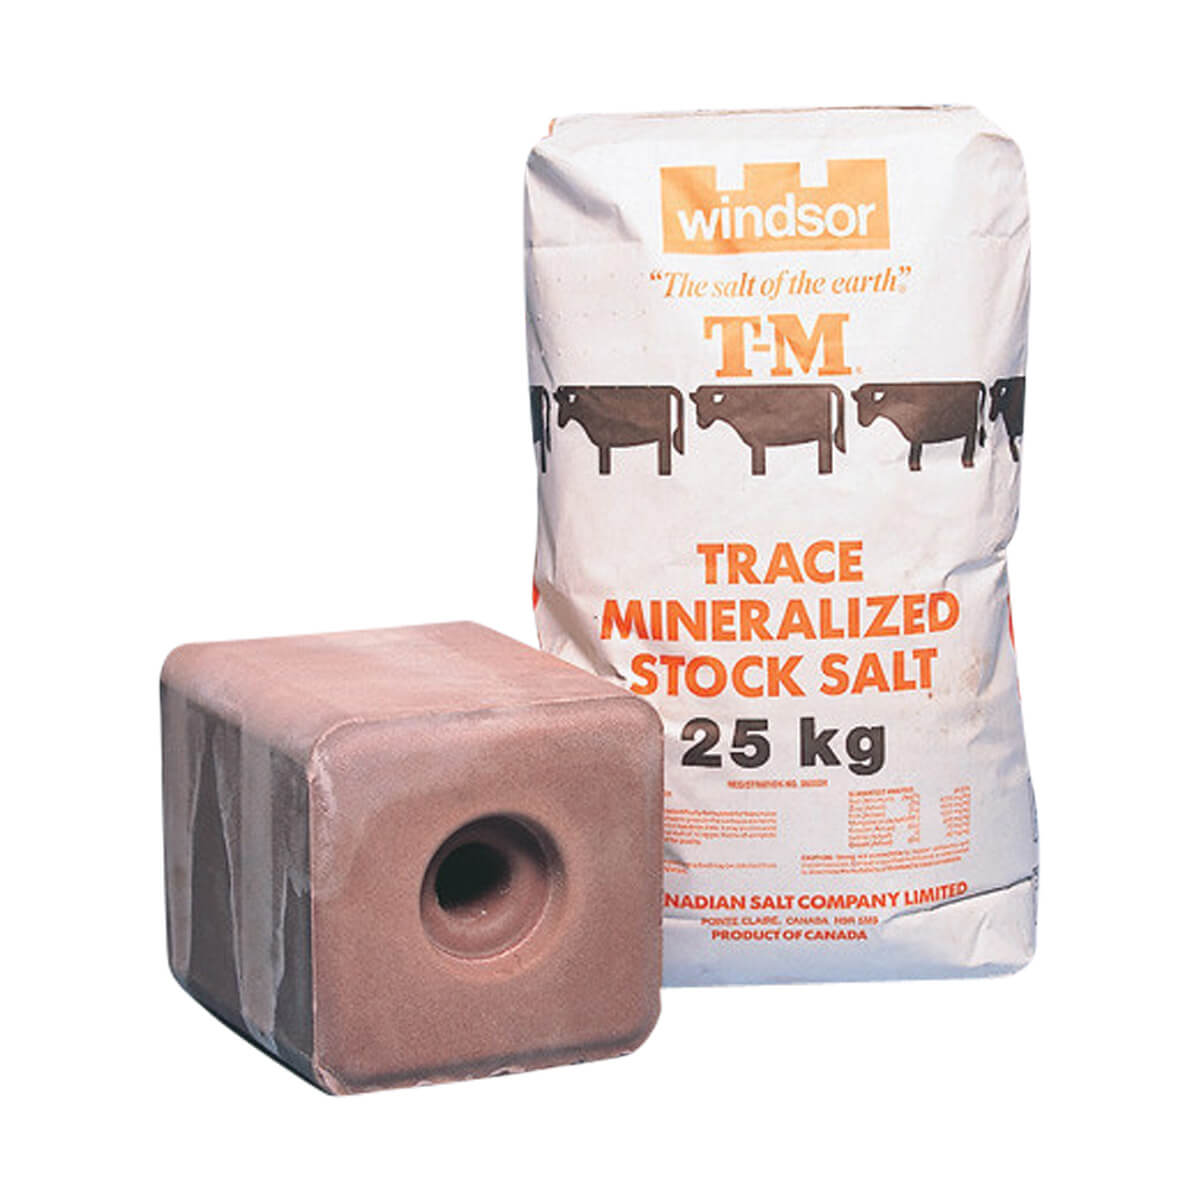 Trace Mineralized Stock Salt - Block - 20 kg